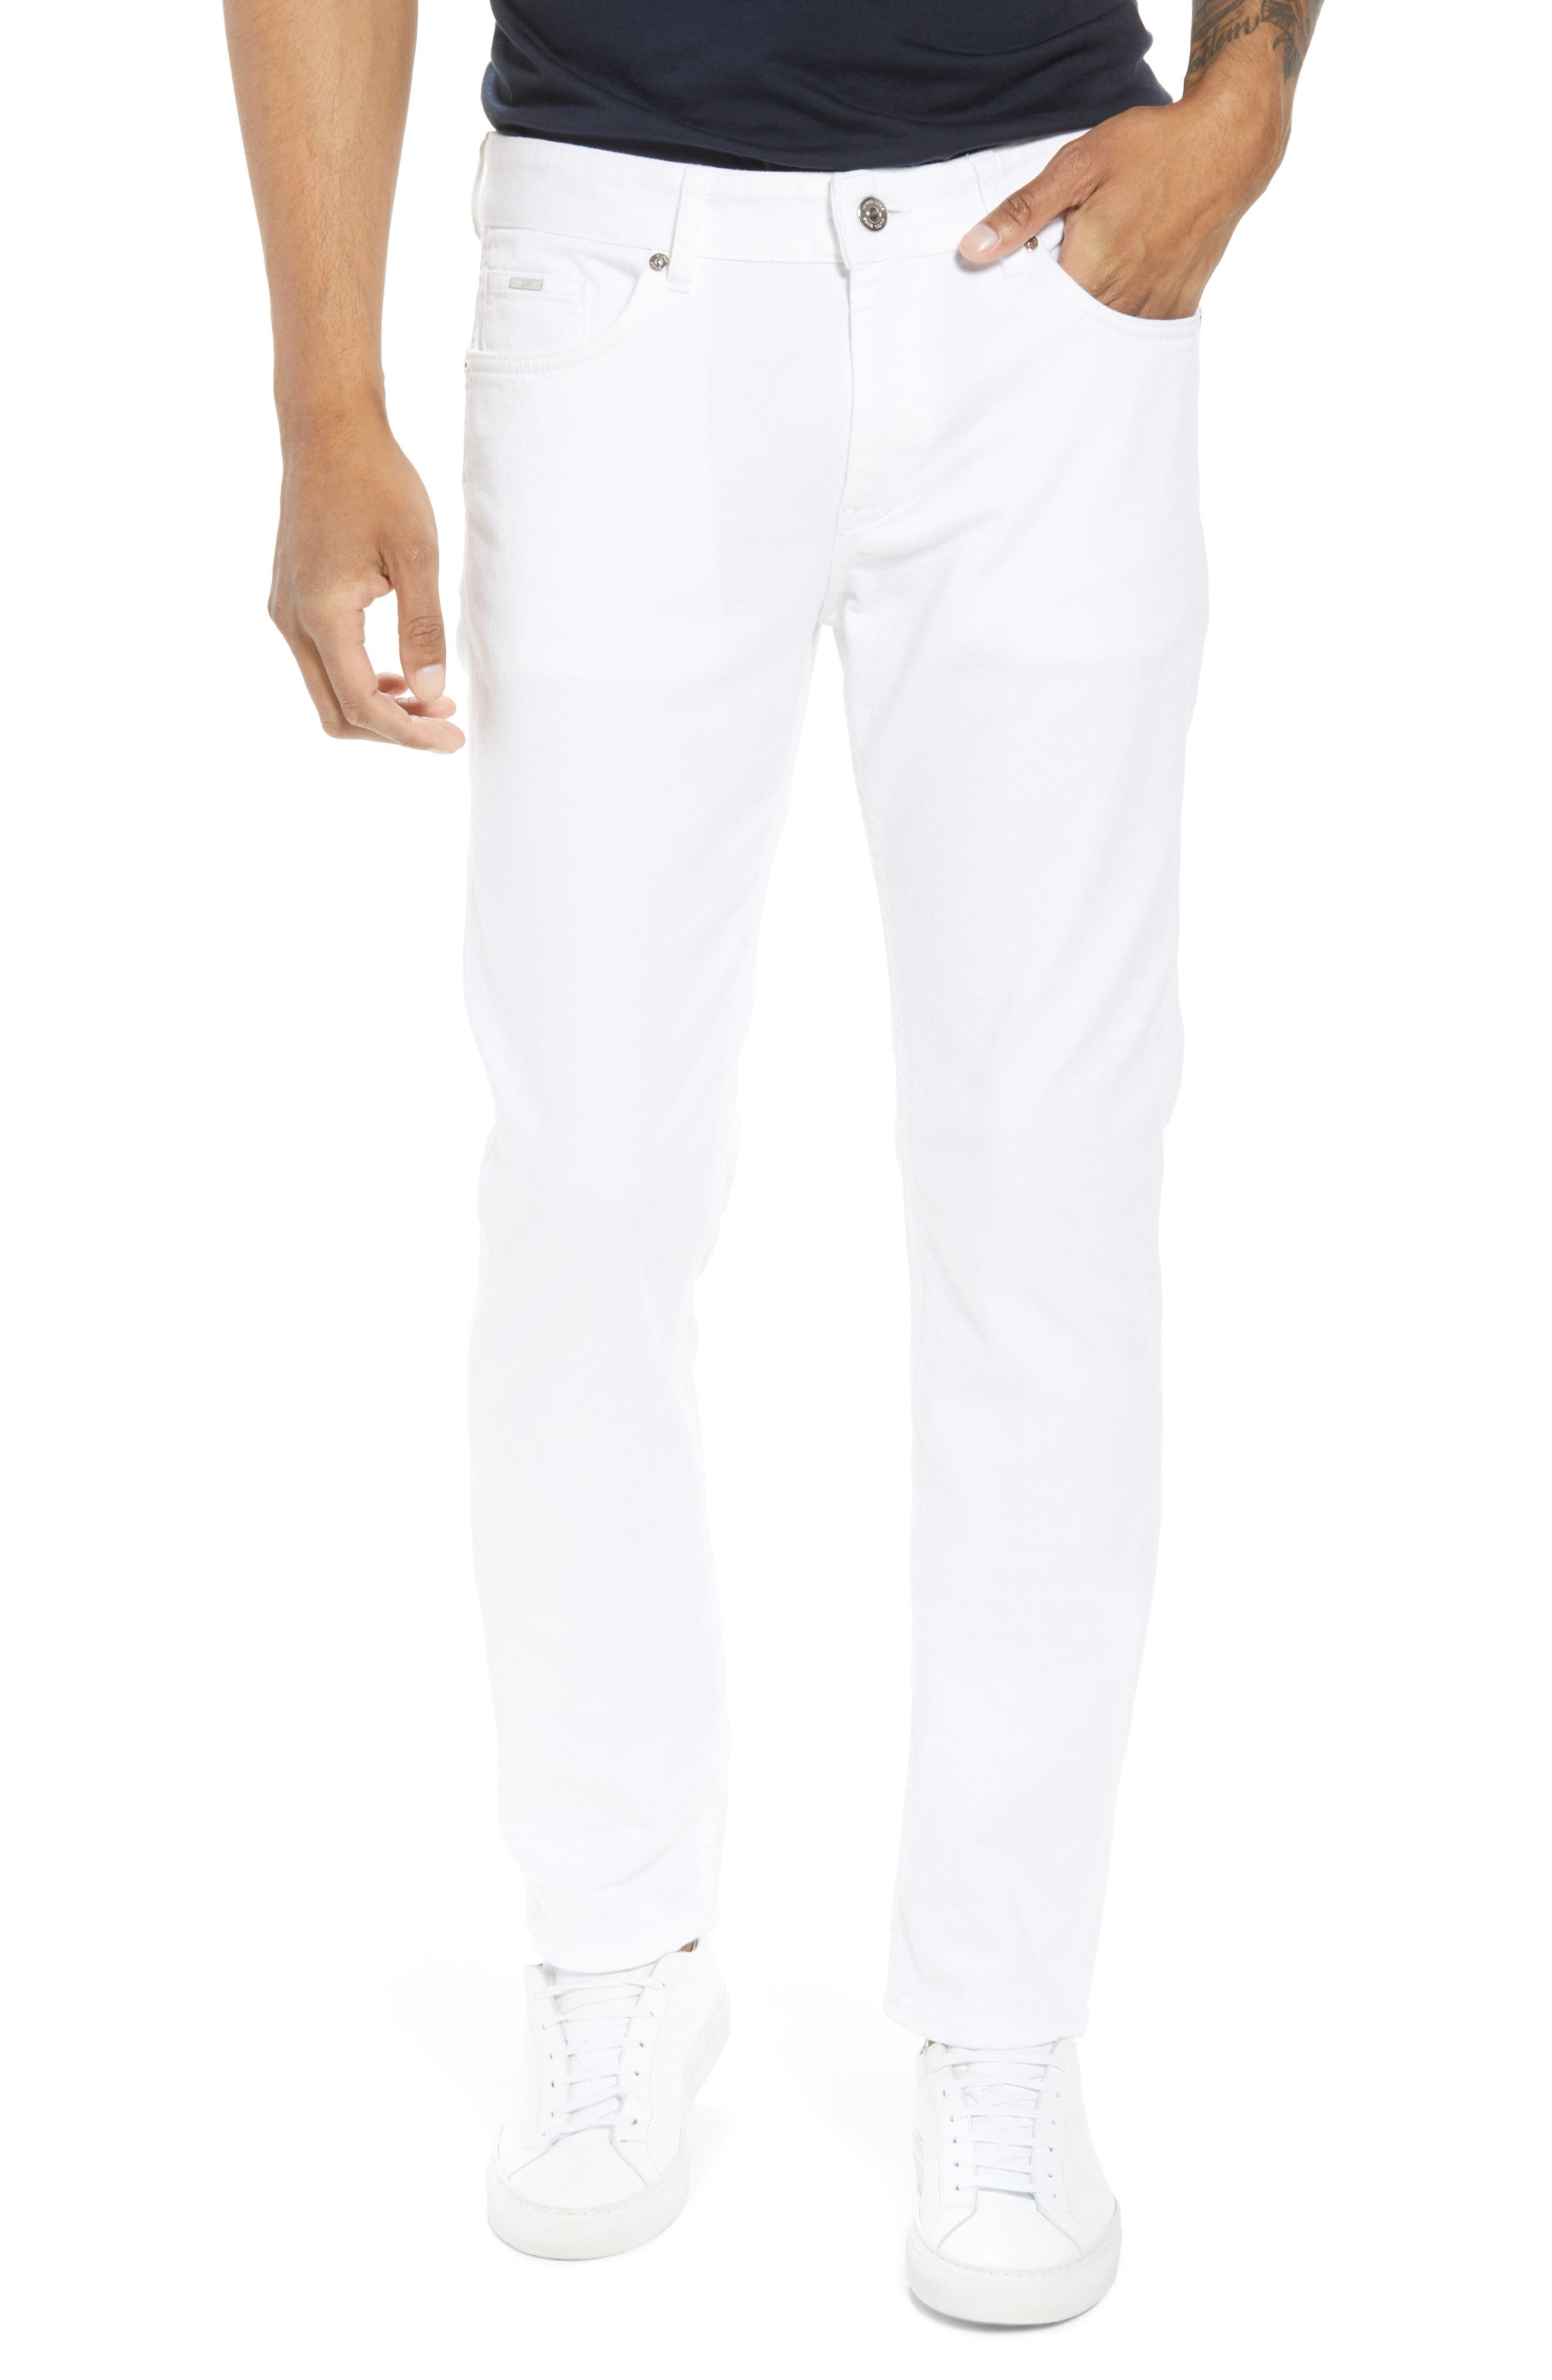 Delaware Slim Fit Jeans,                         Main,                         color, White